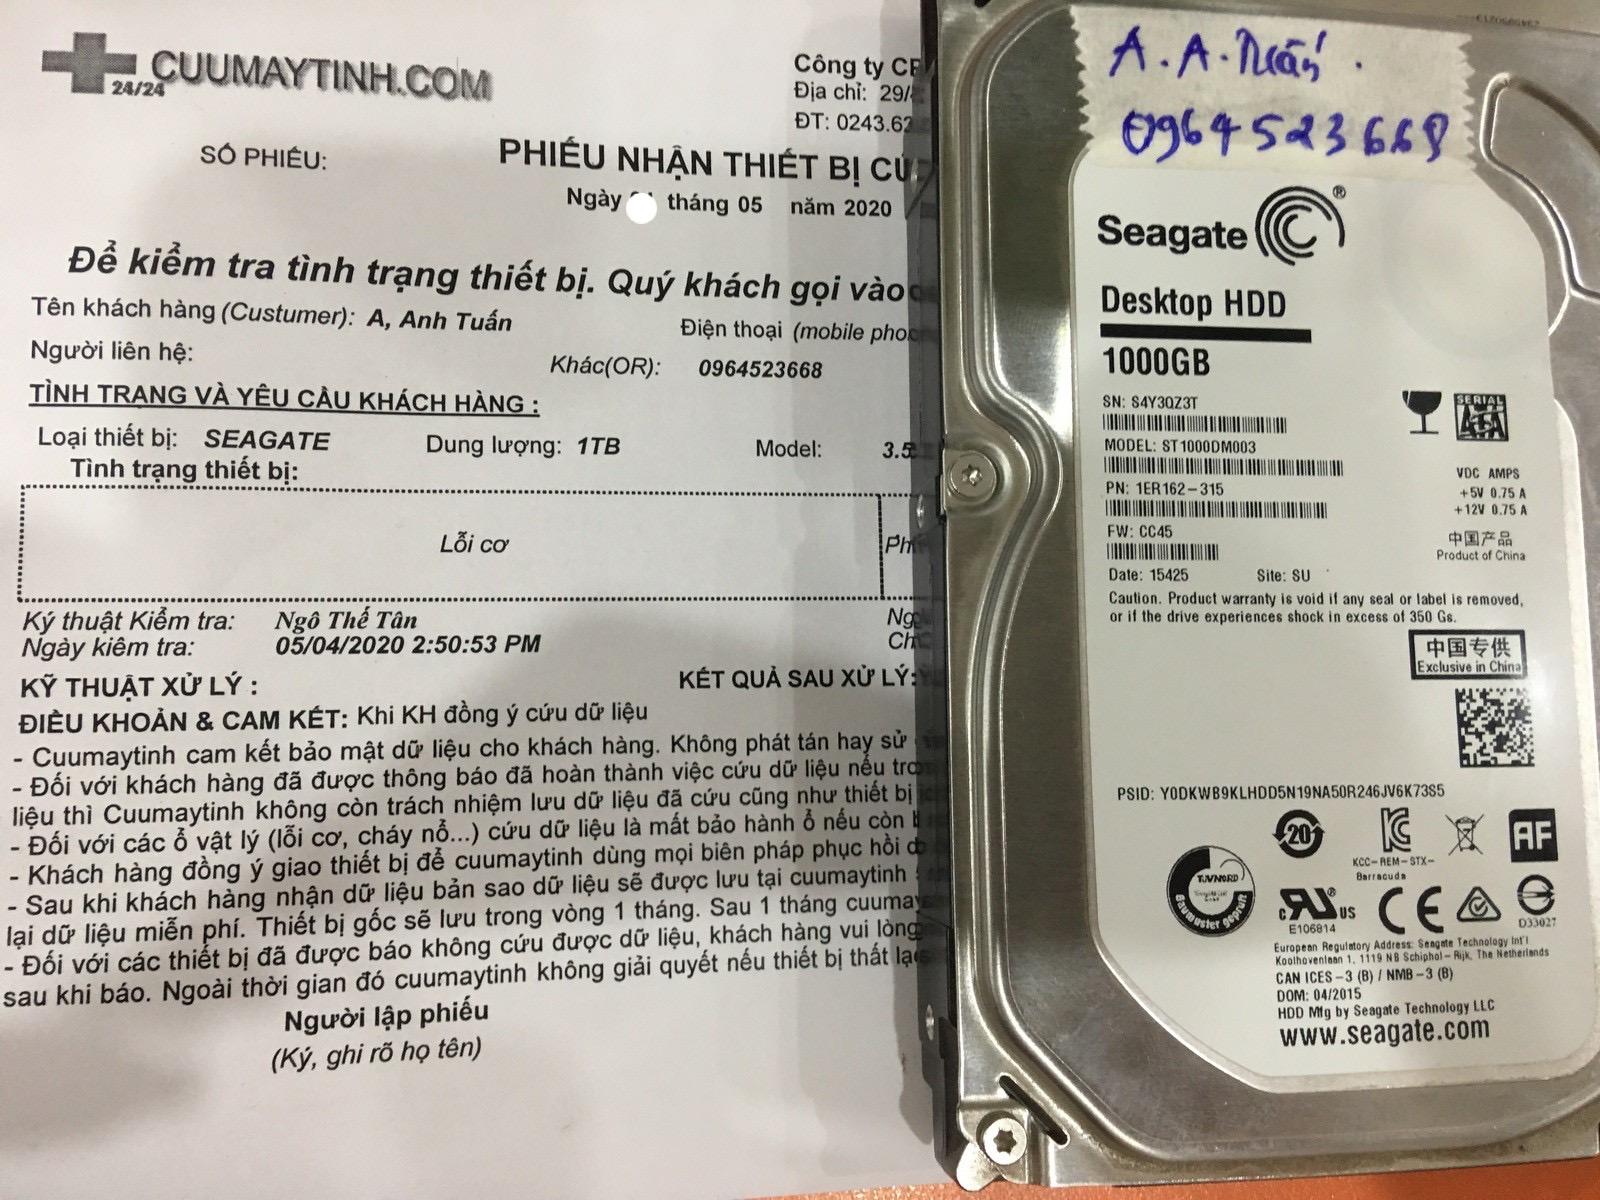 Phục hồi dữ liệu ổ cứng Seagate 1TB lỗi cơ 30/05/2020 - cuumaytinh